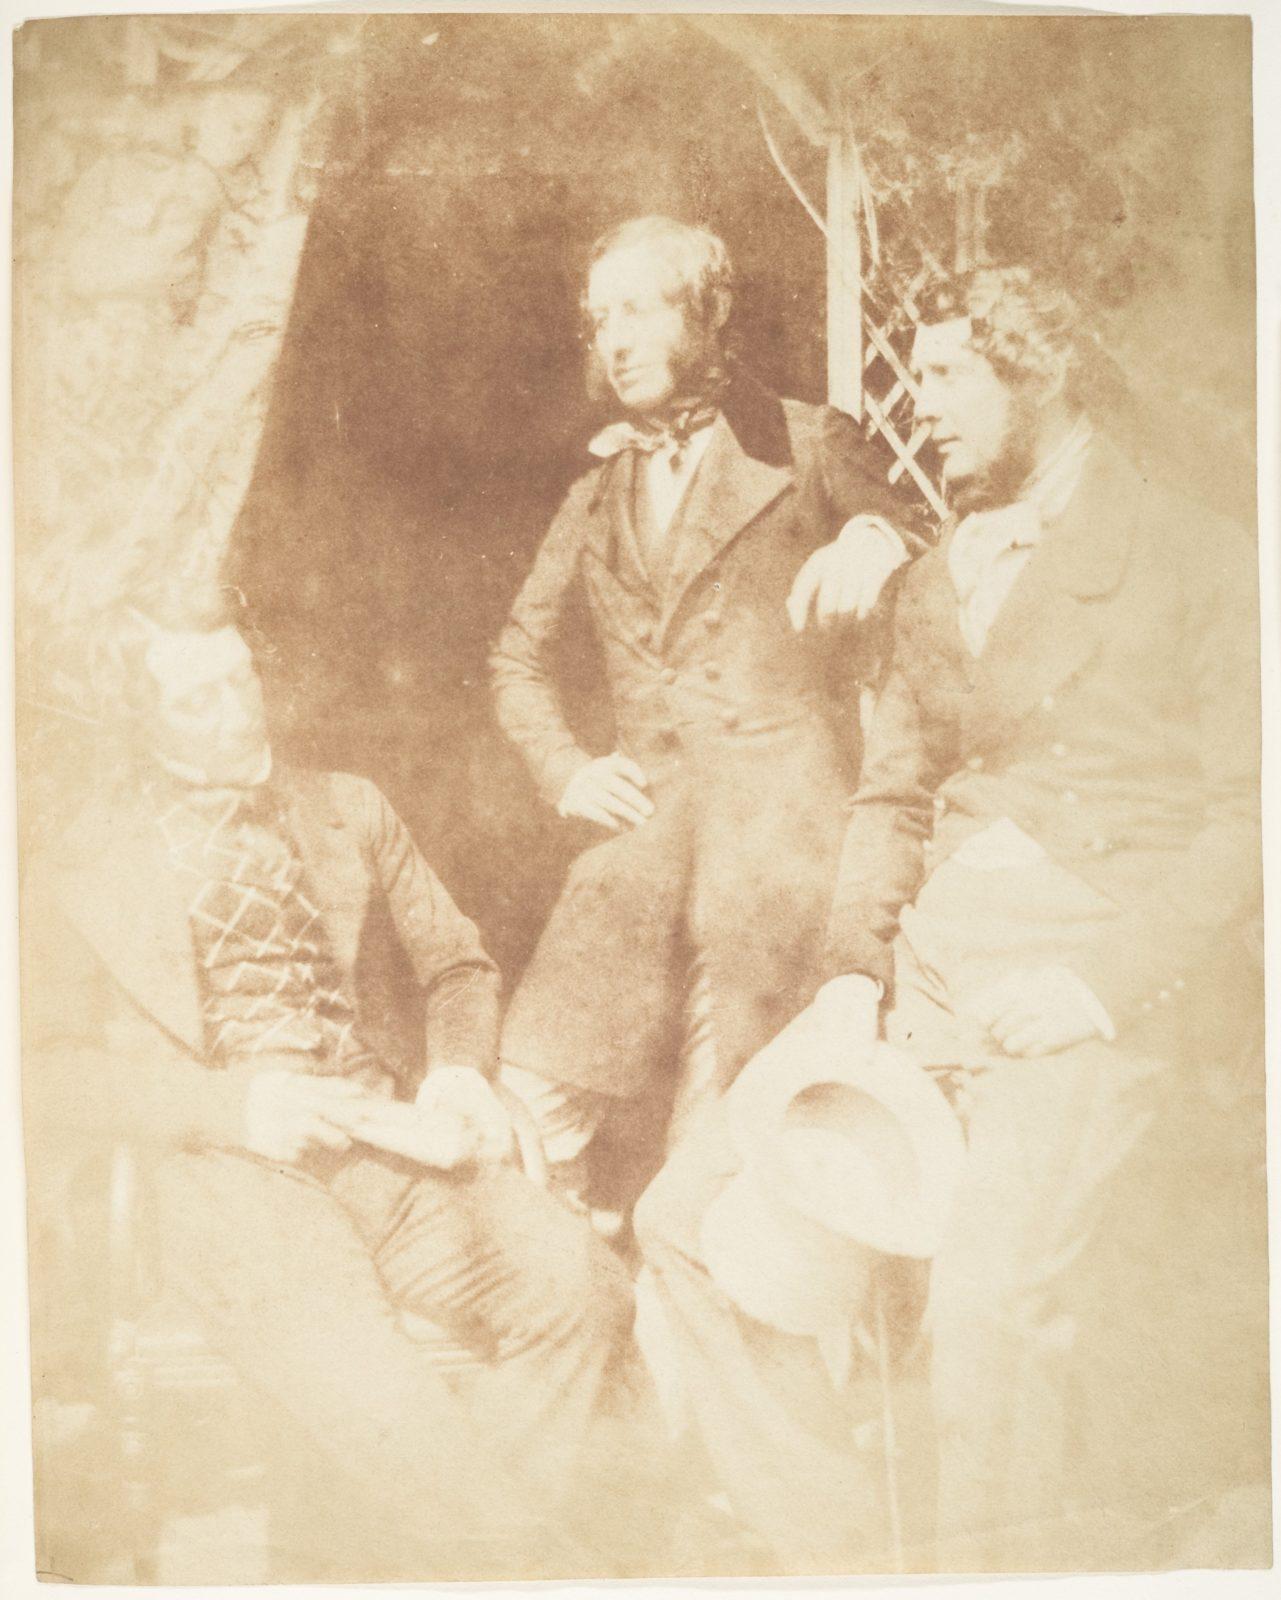 Ogilvie Fairly, Capt. Hamilton, and Gilmore